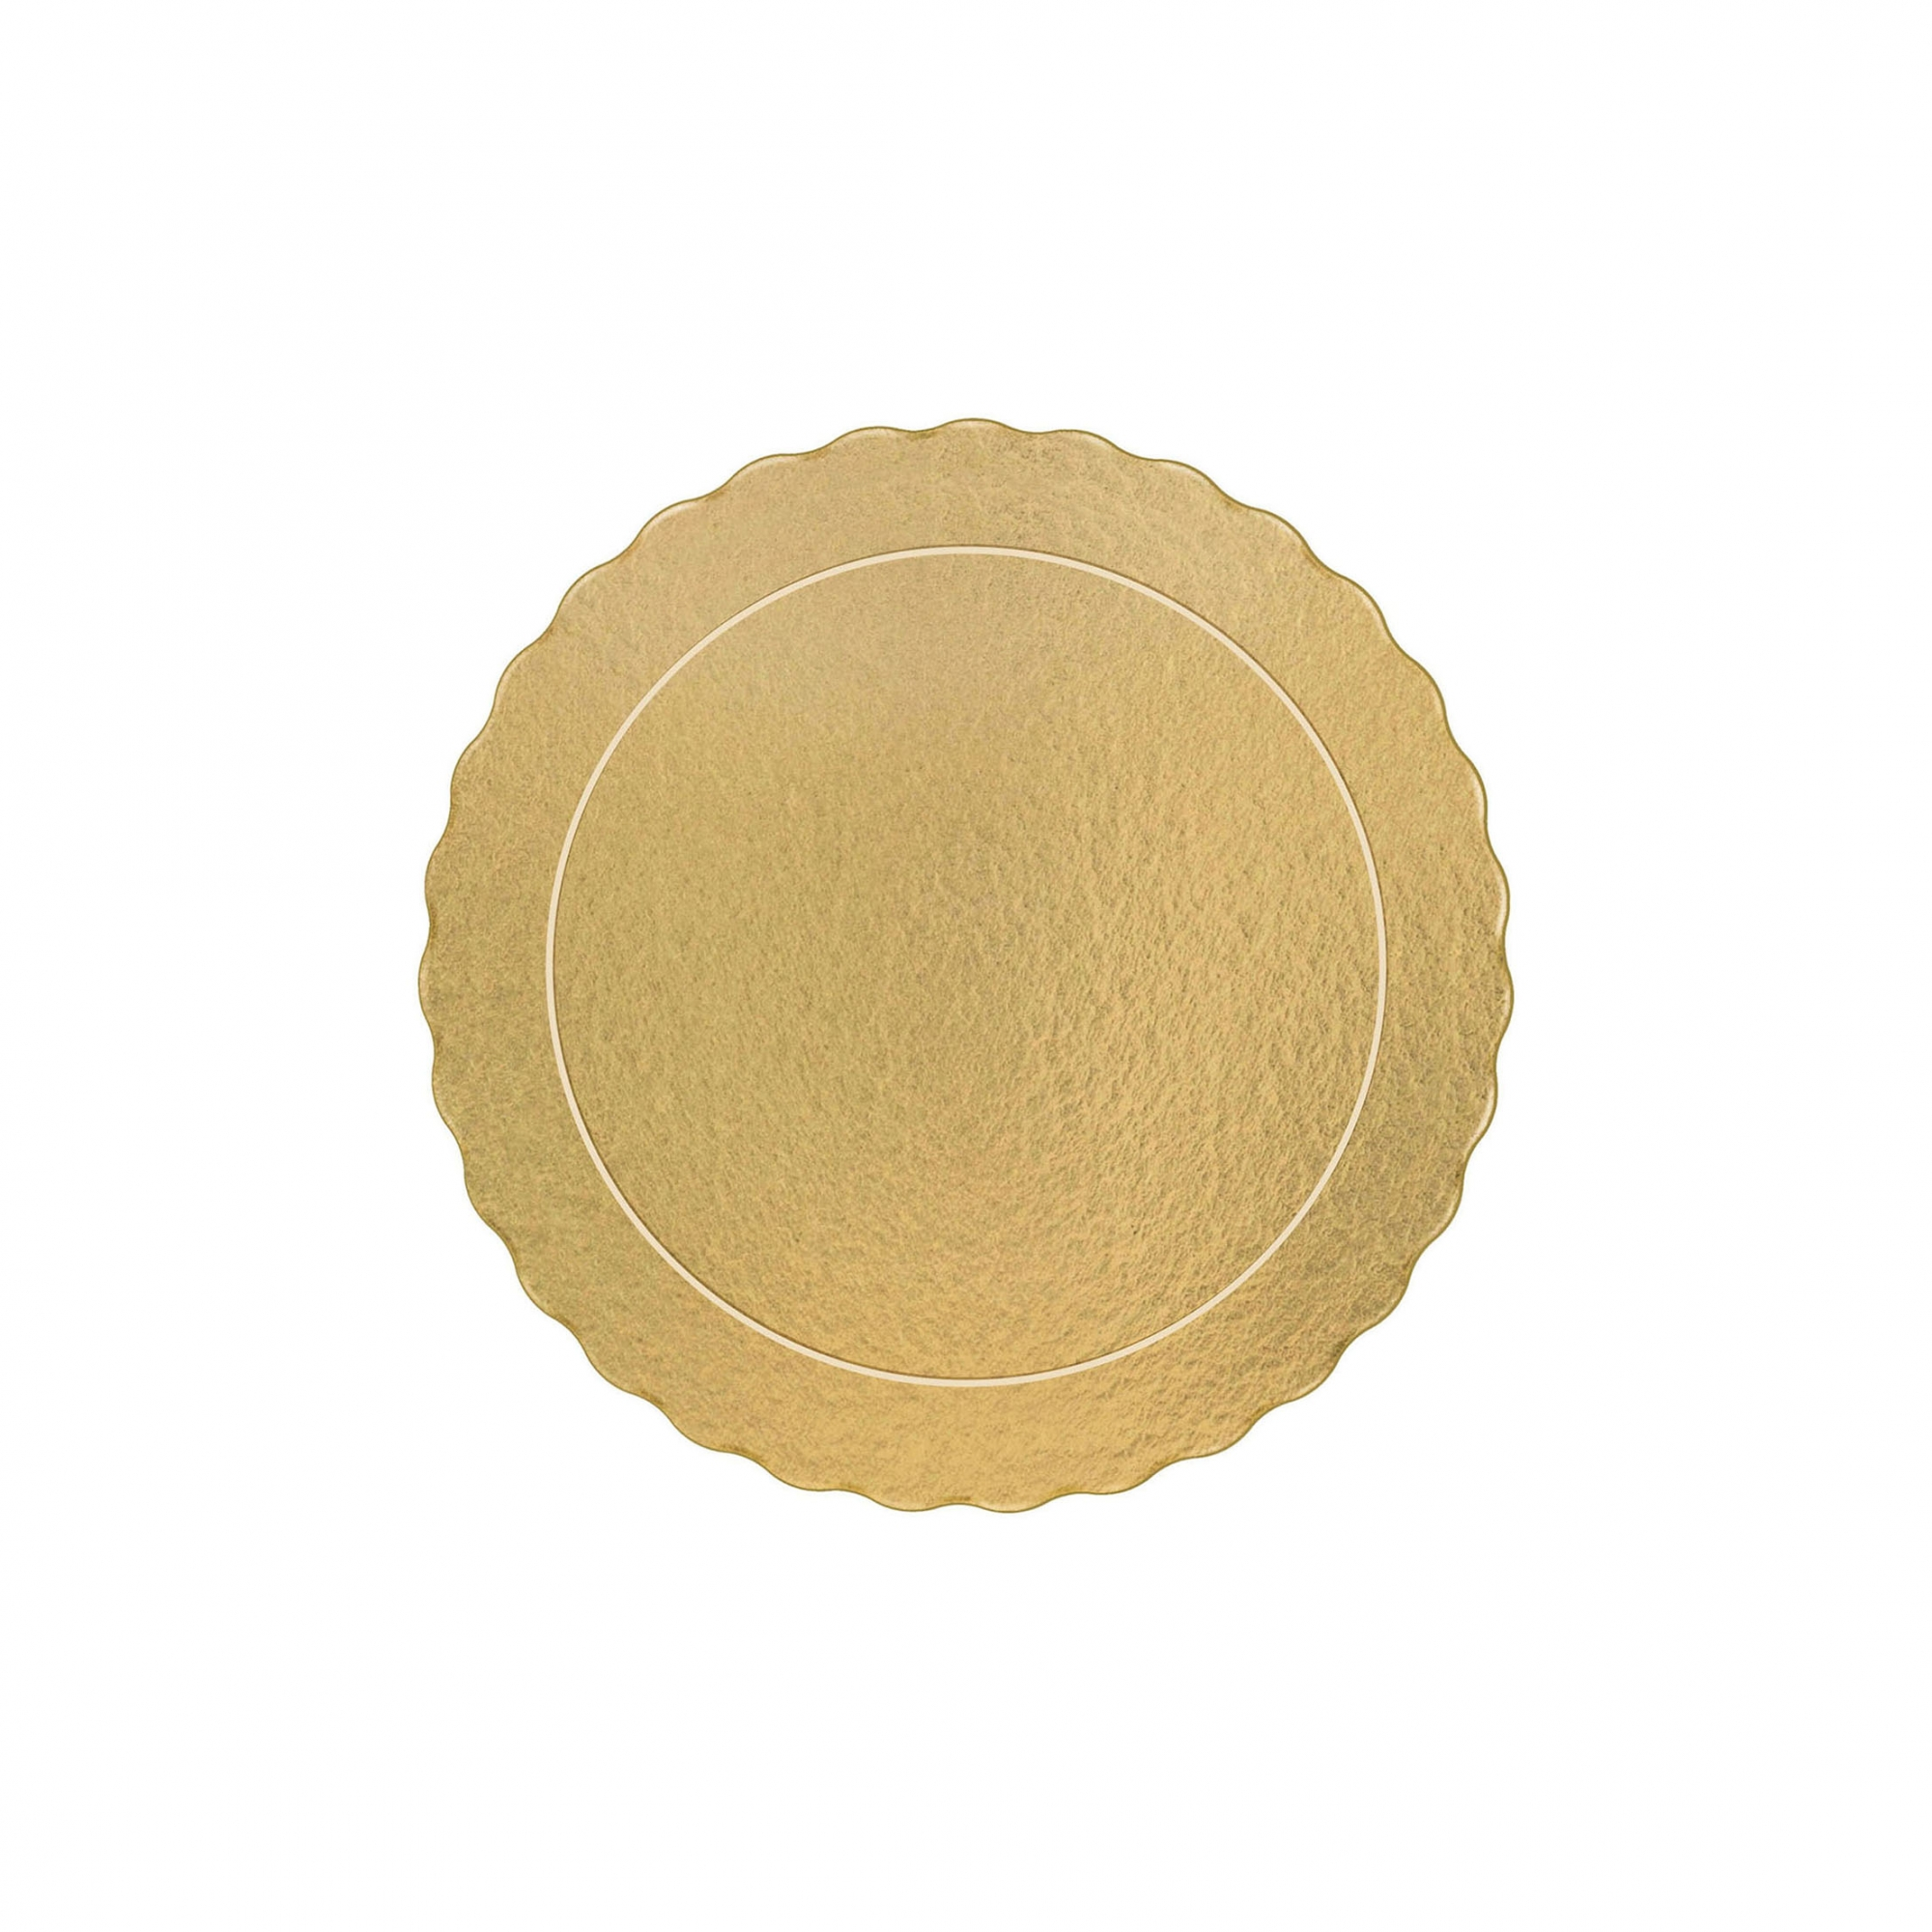 50 Bases Laminadas, Suporte P/ Bolo, Cake Board, 20cm - Ouro